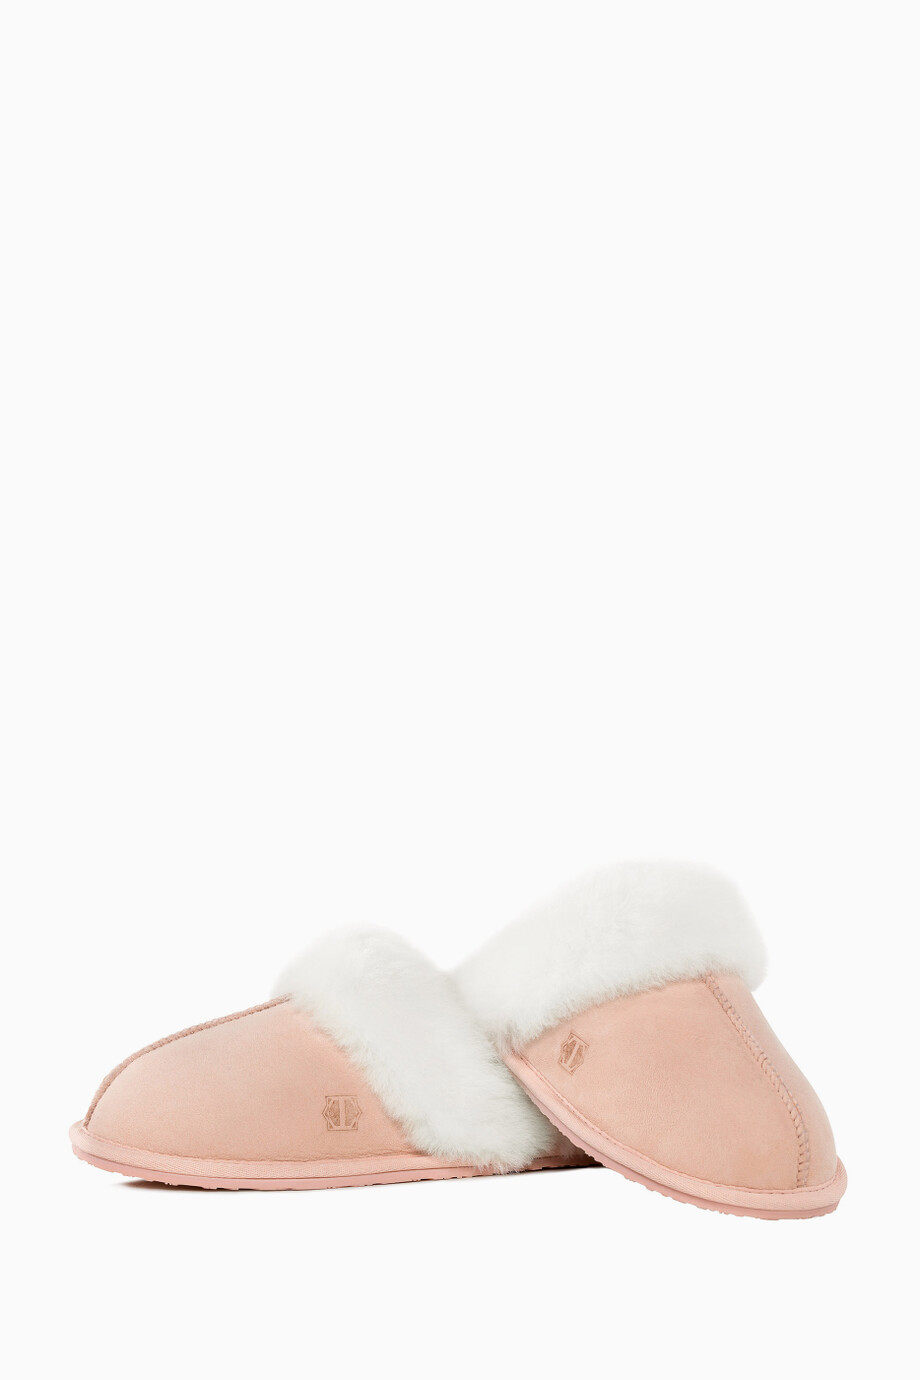 4da24bcc3 تسوق حذاء أماندا سهل الارتداء من جلد الغنم Togas وردي للنساء   اُناس